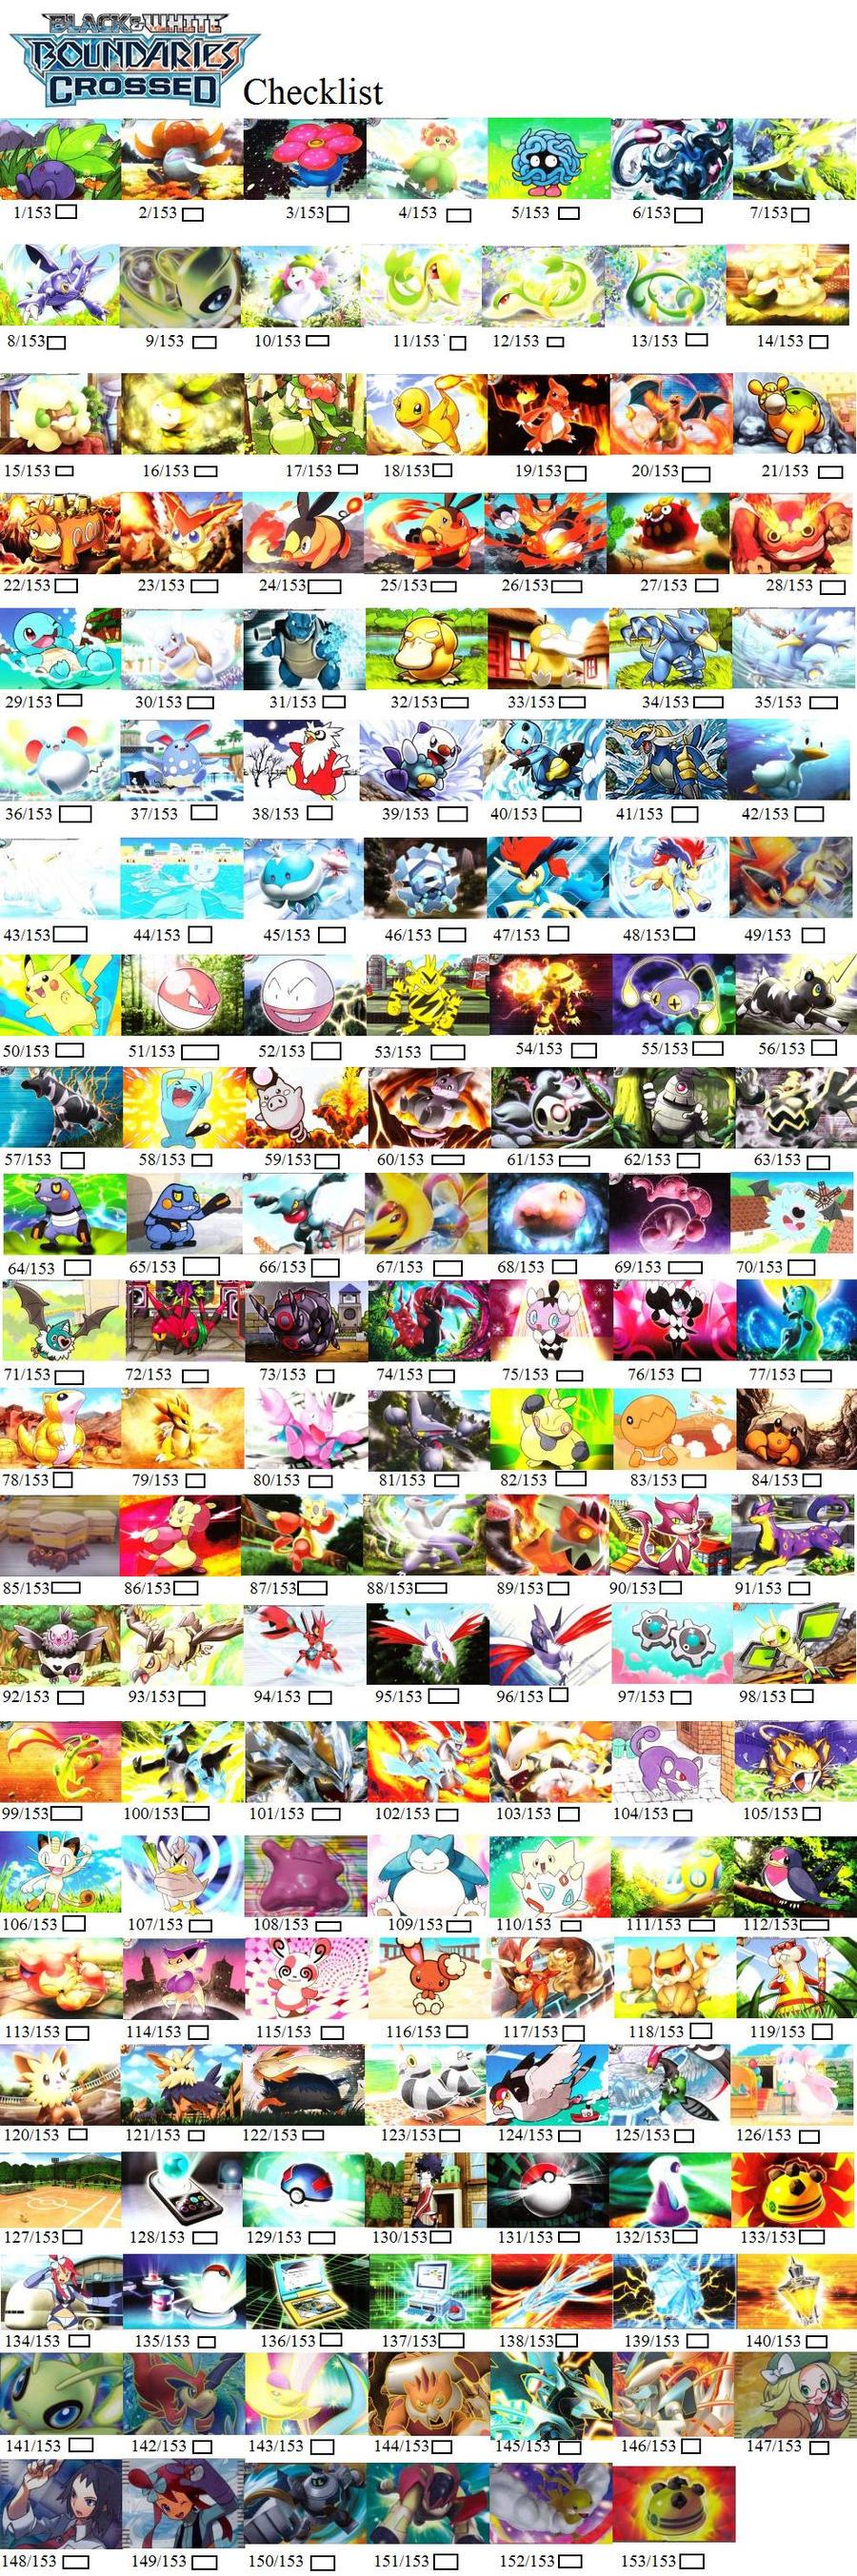 Original Pokemon Cards List Pokemon boundaries crossedOriginal Pokemon Cards List